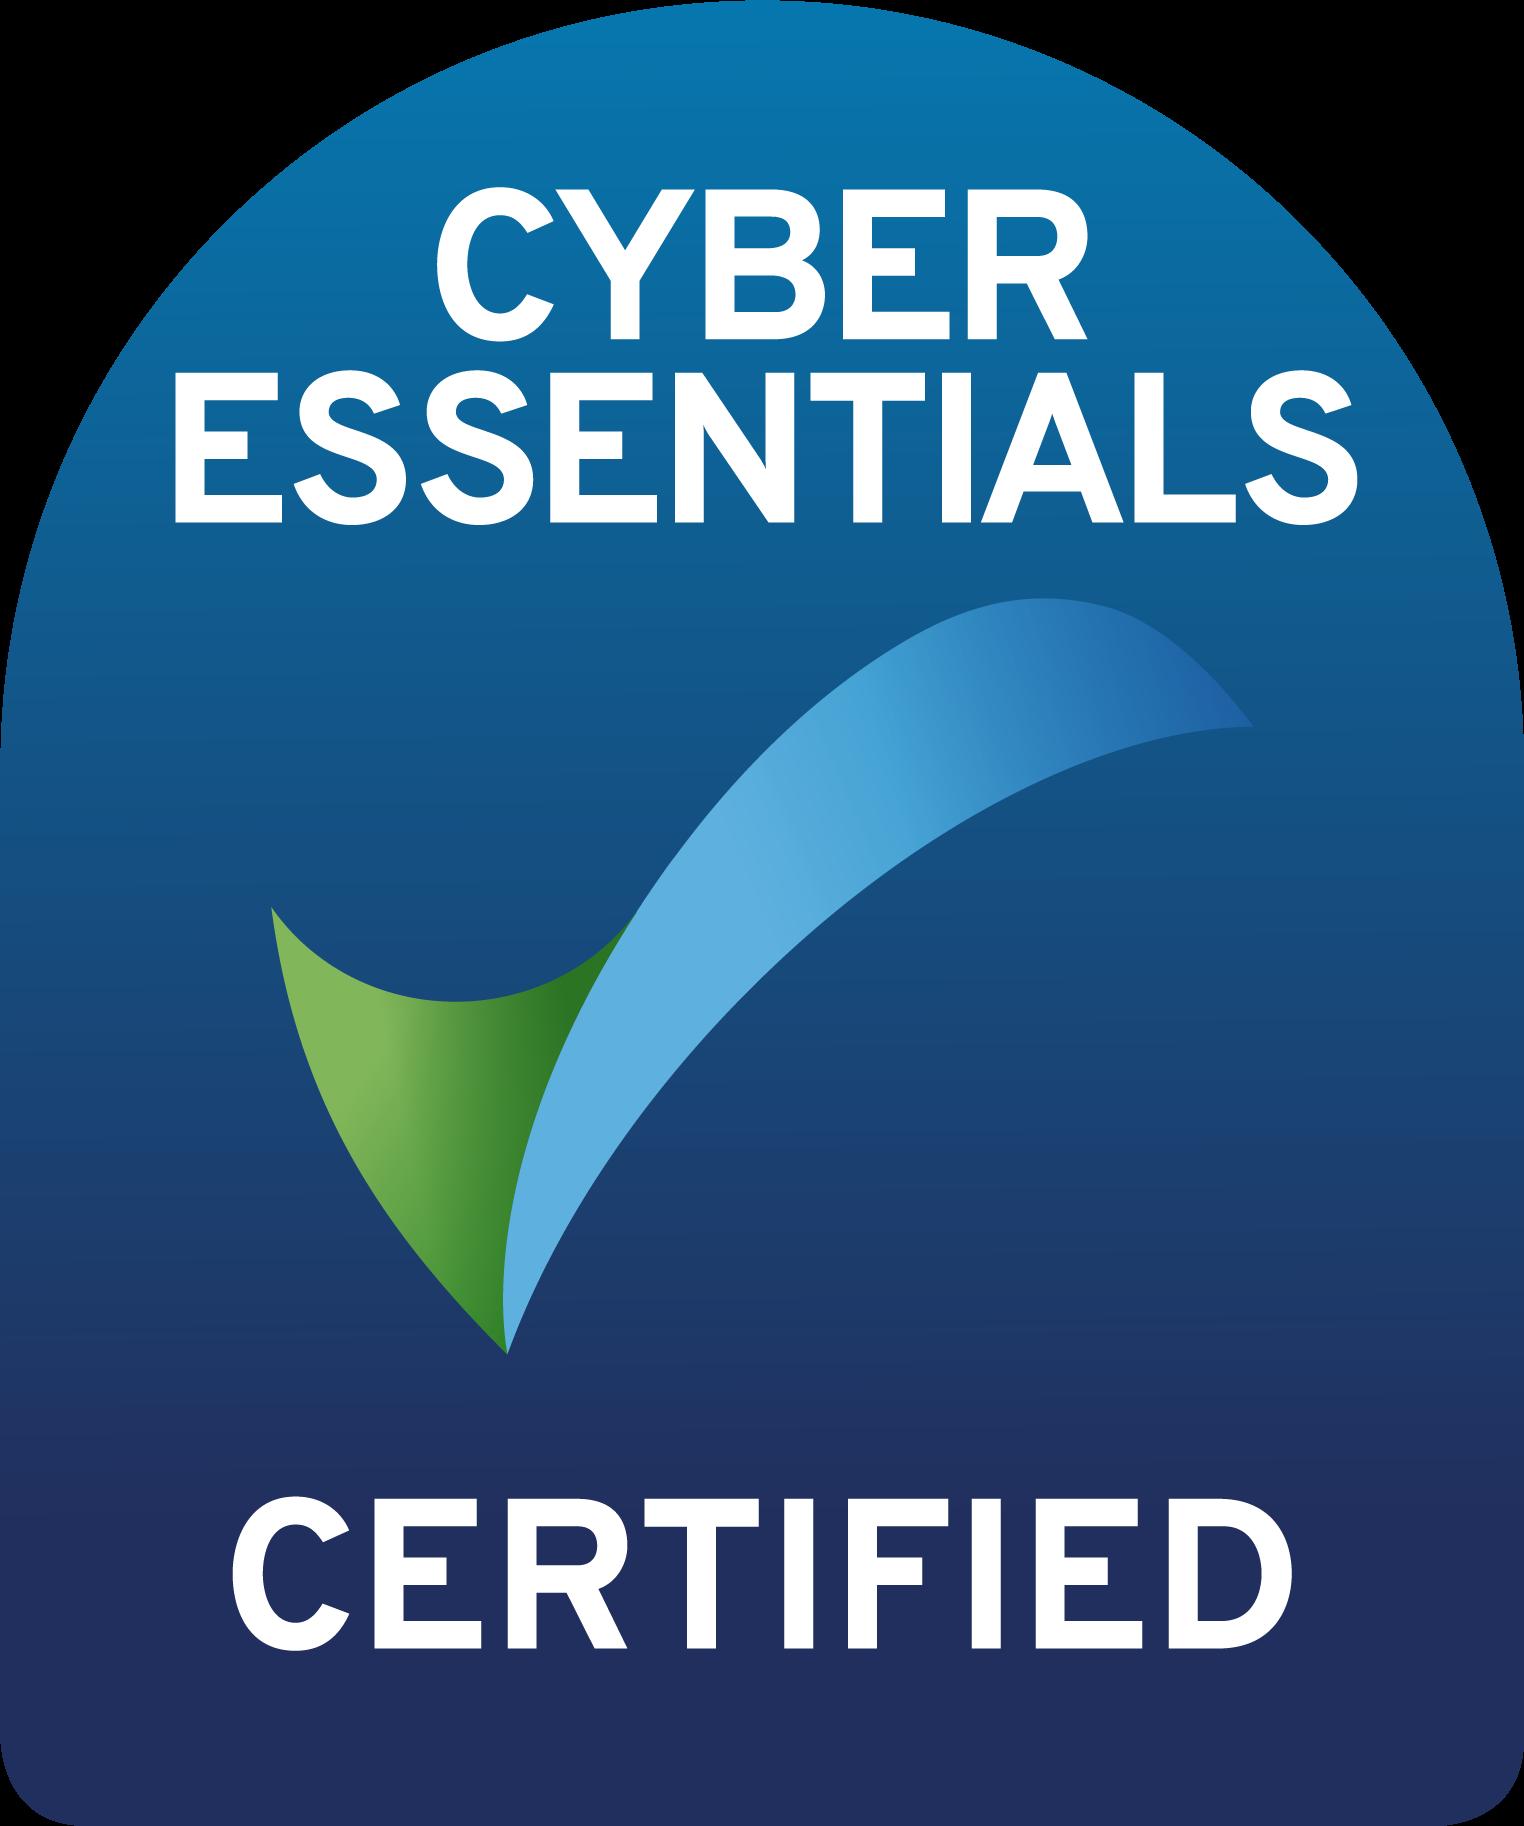 Cyber essentails certified